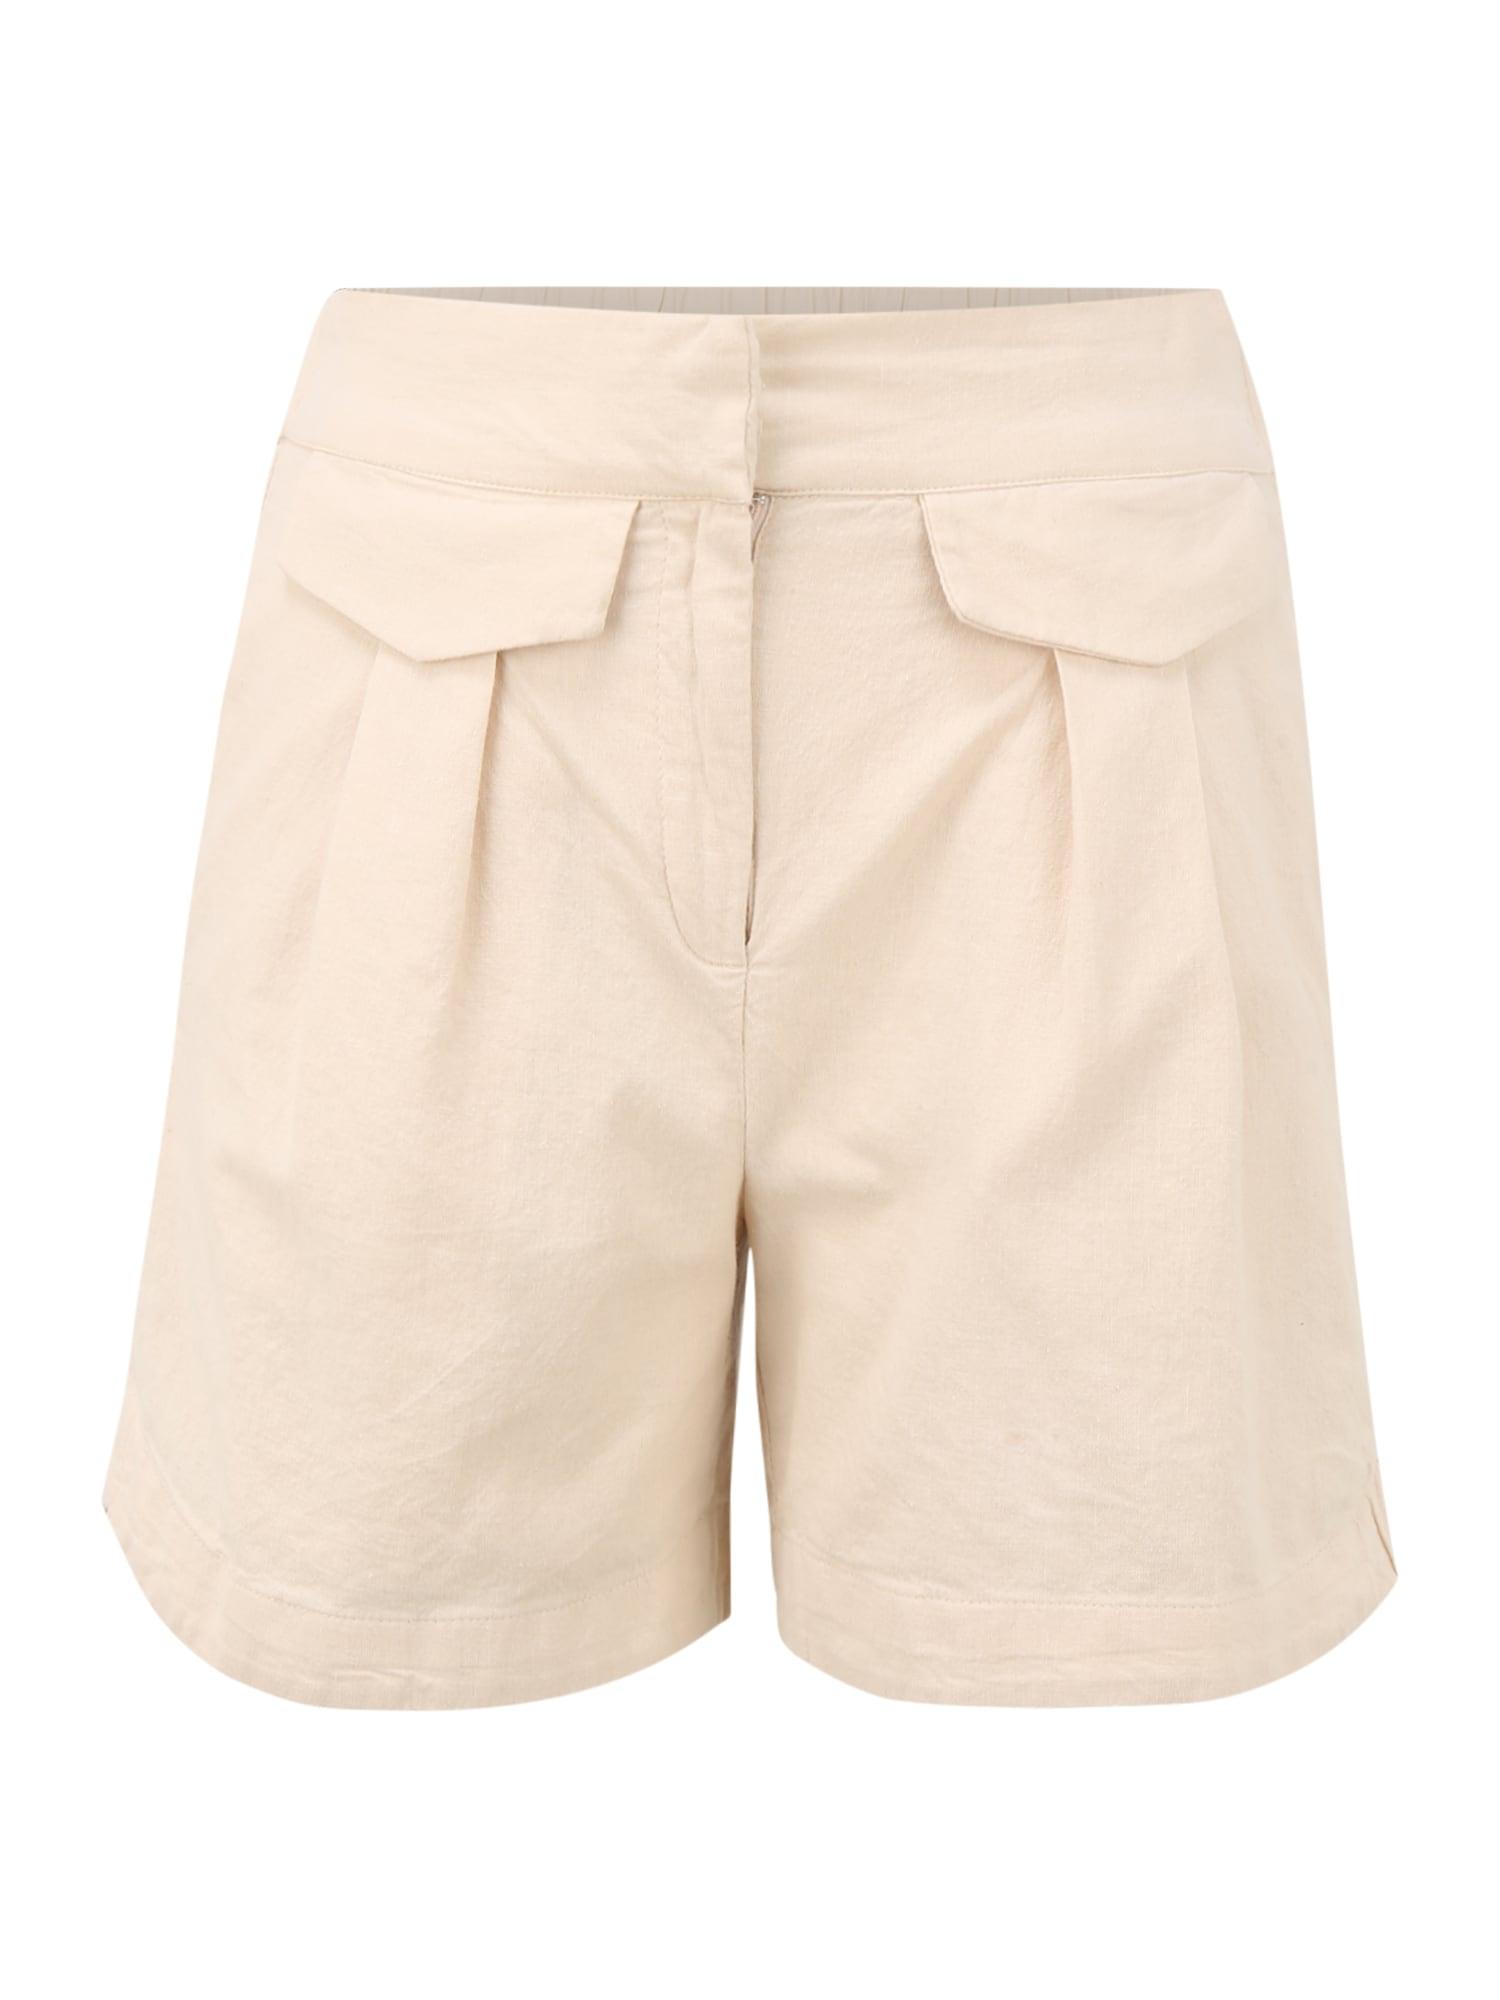 Selected Femme Petite Klostuotos kelnės